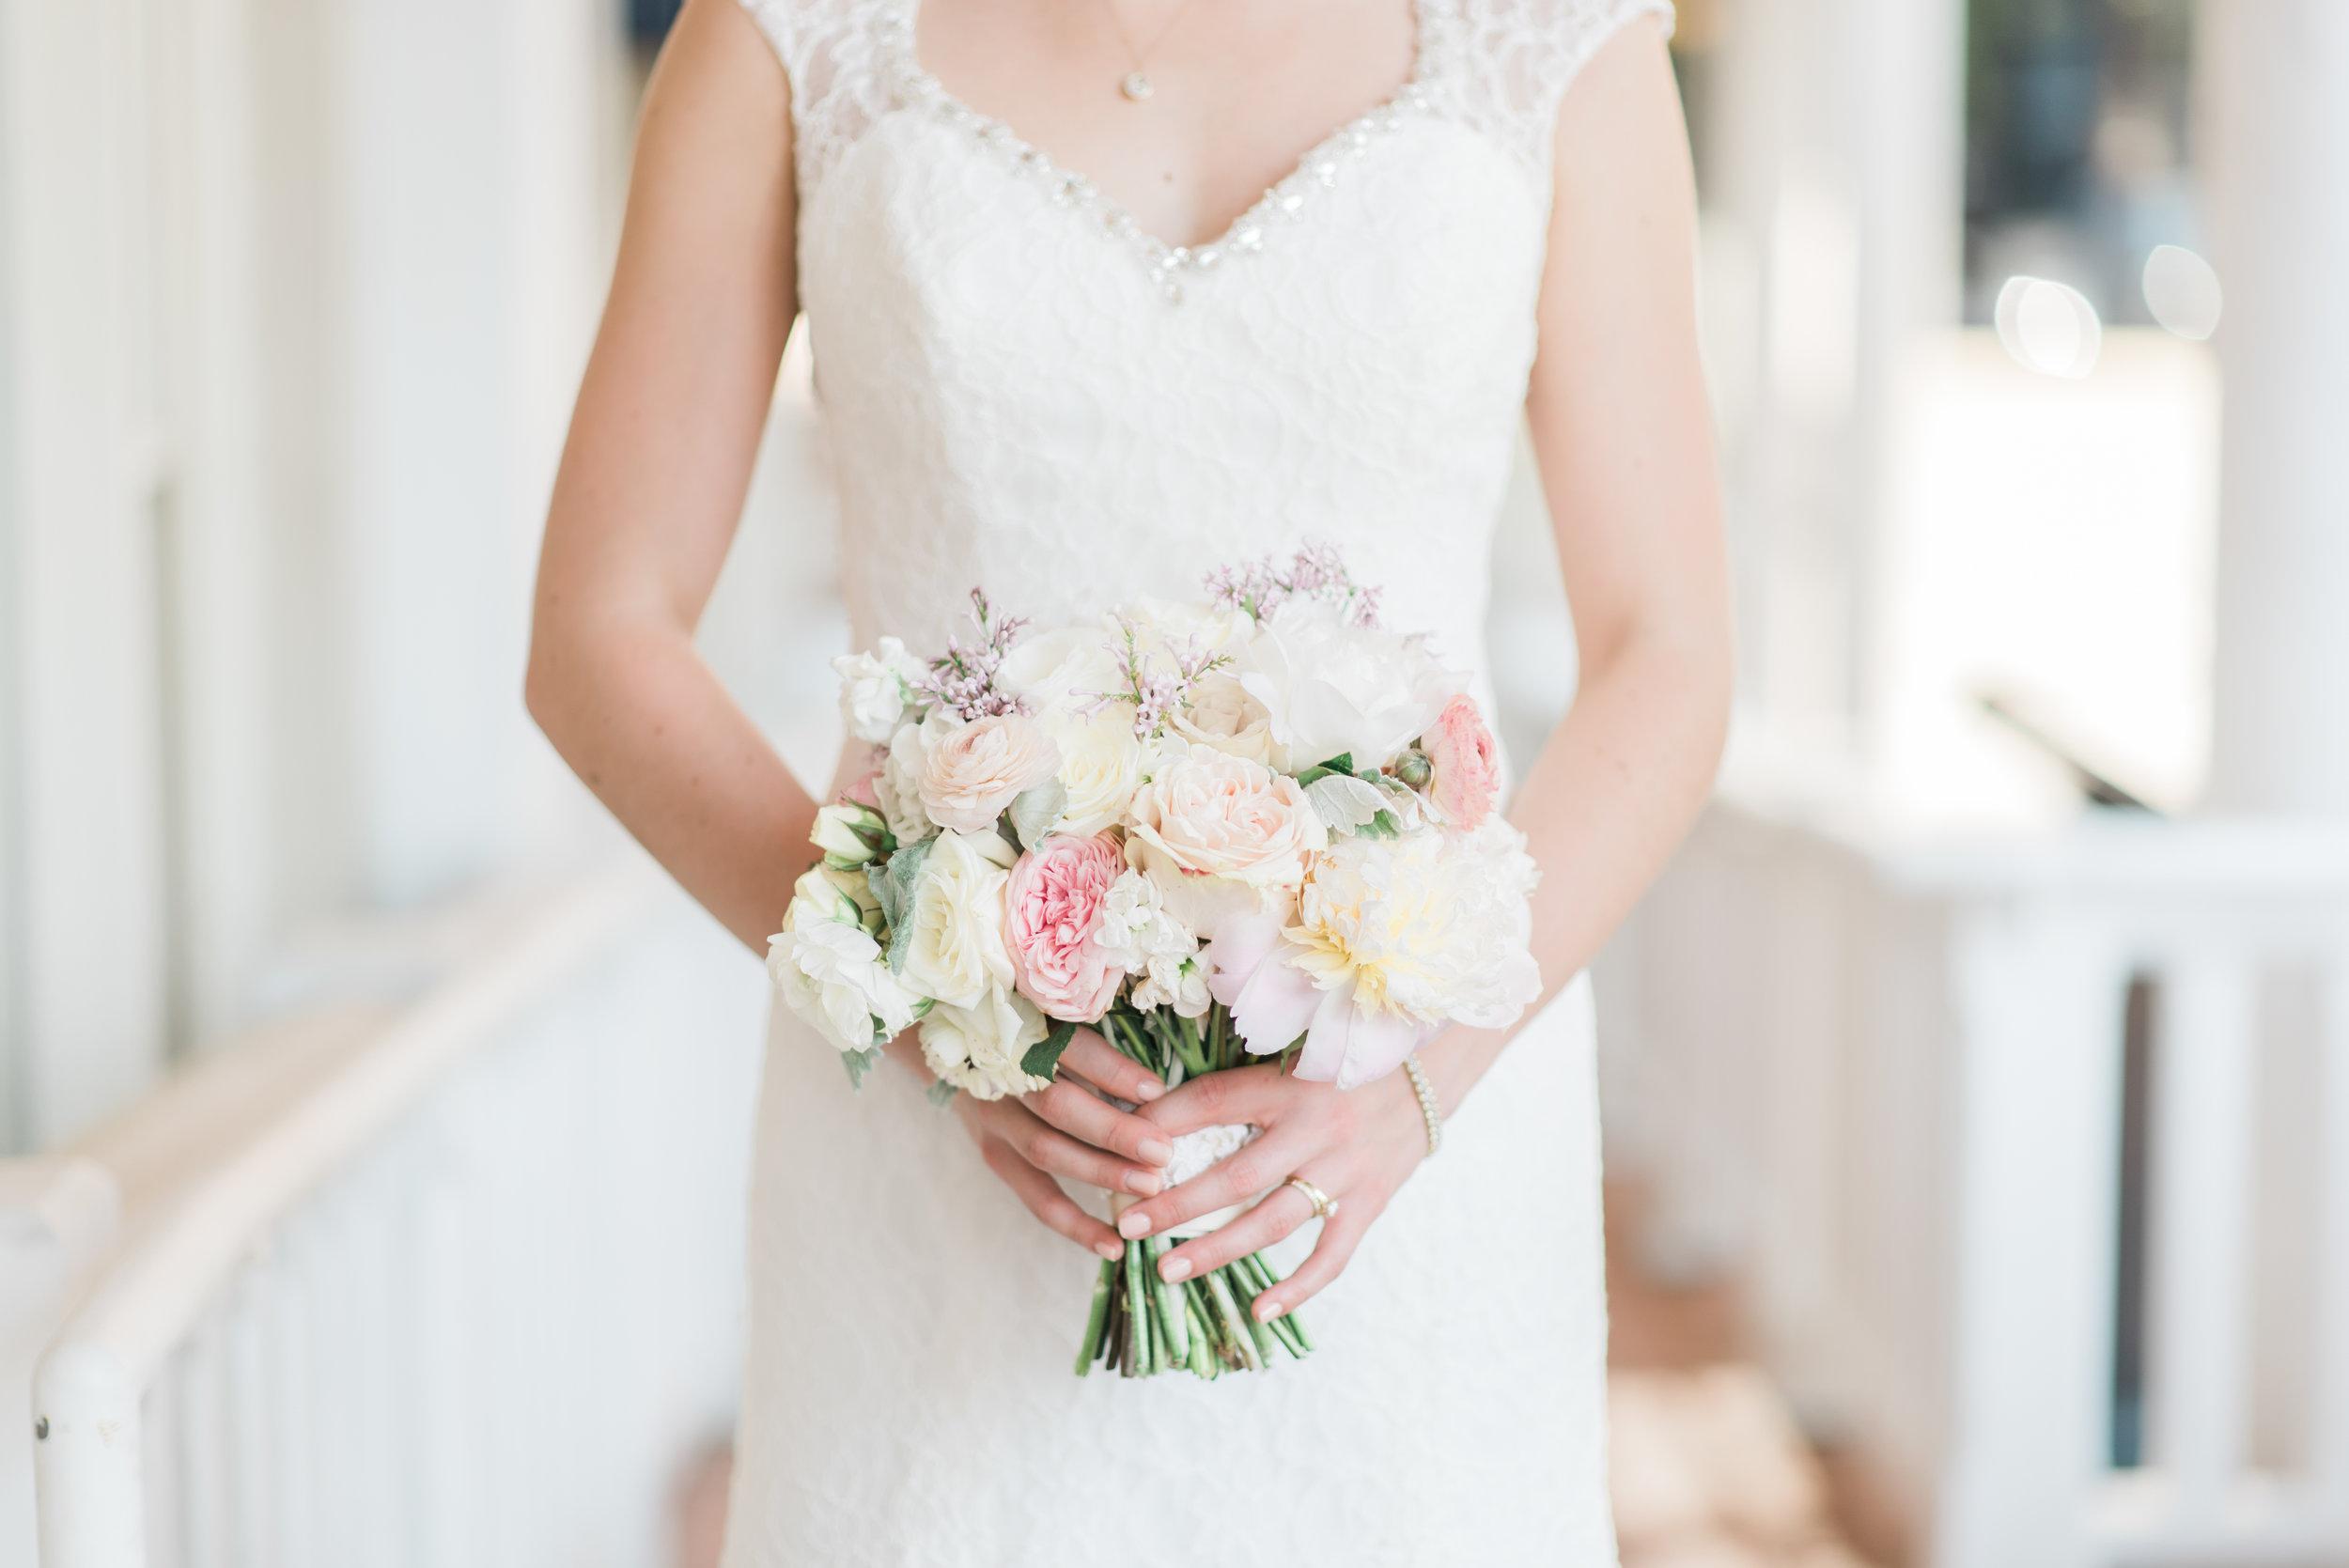 Mccoy-Emmett Wedding-305.jpg